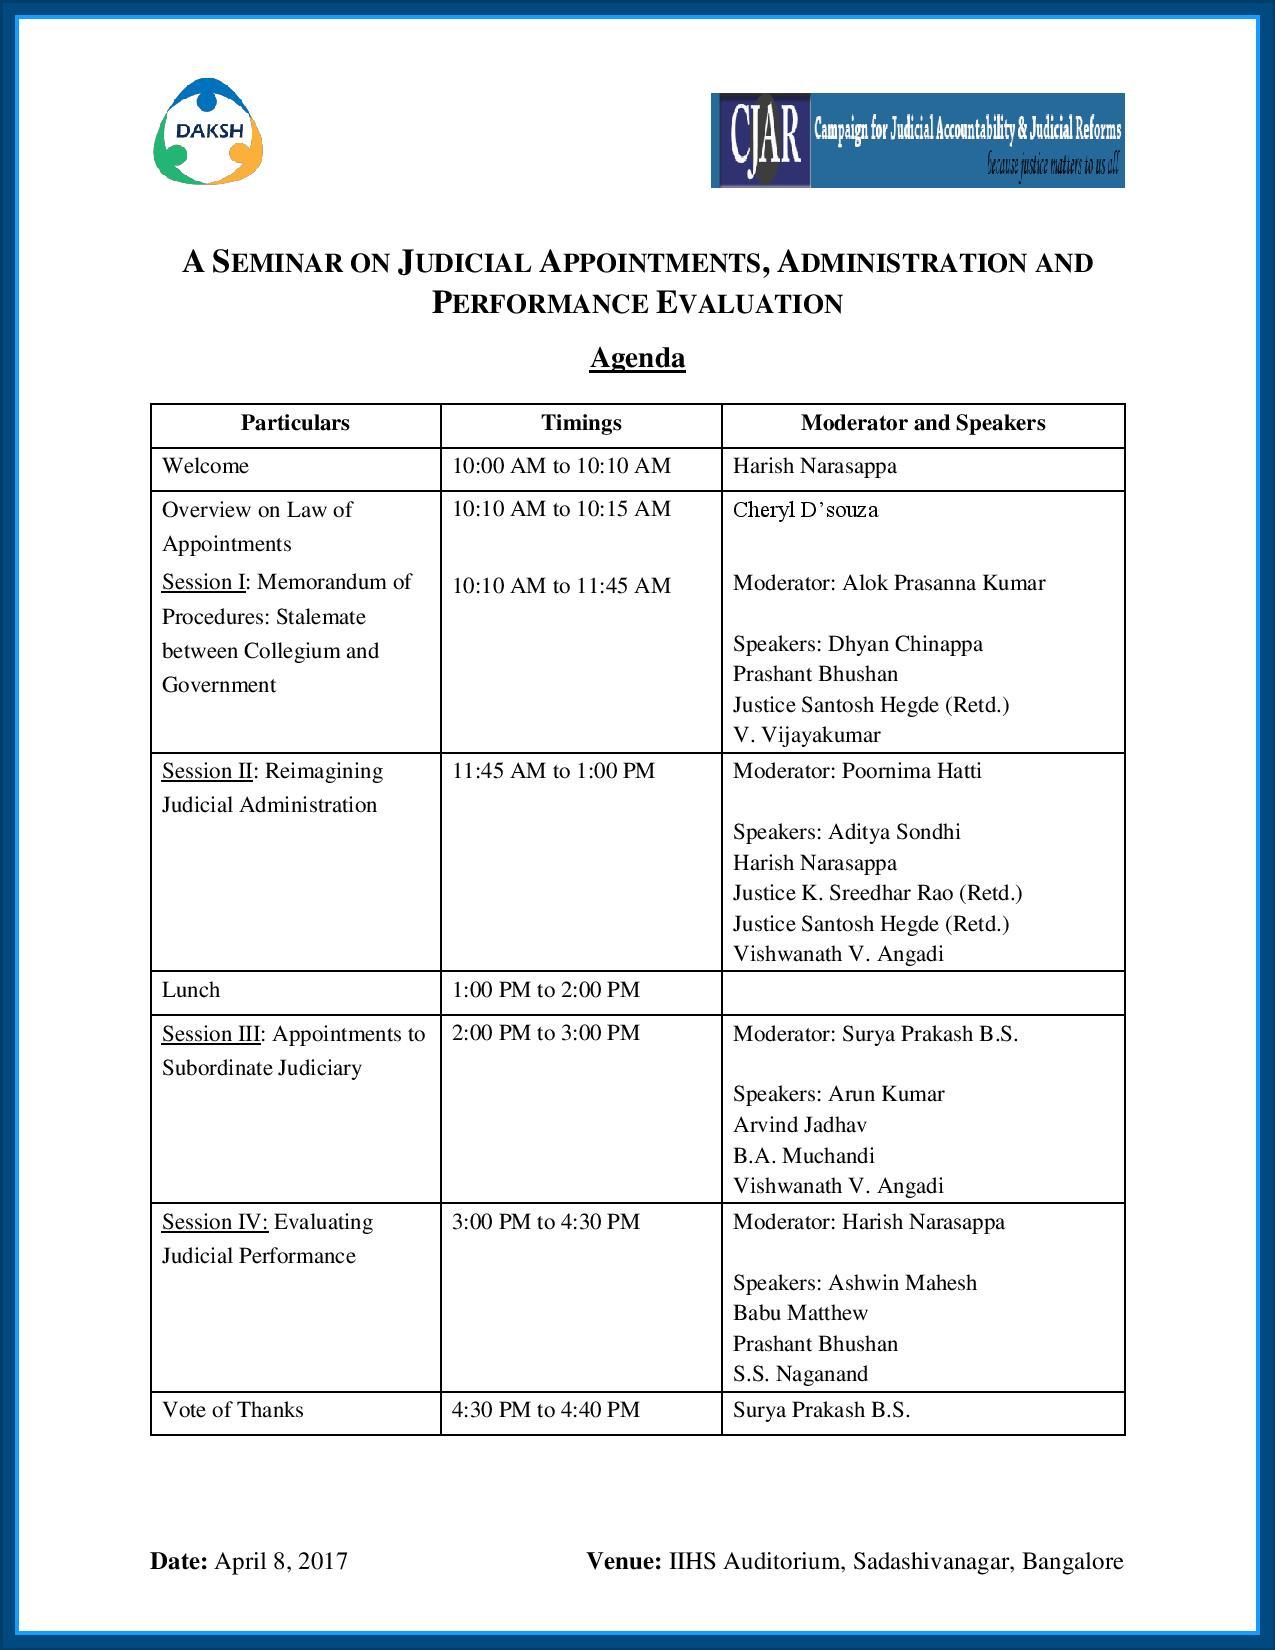 DAKSH - CJAR Seminar Agenda-page-001